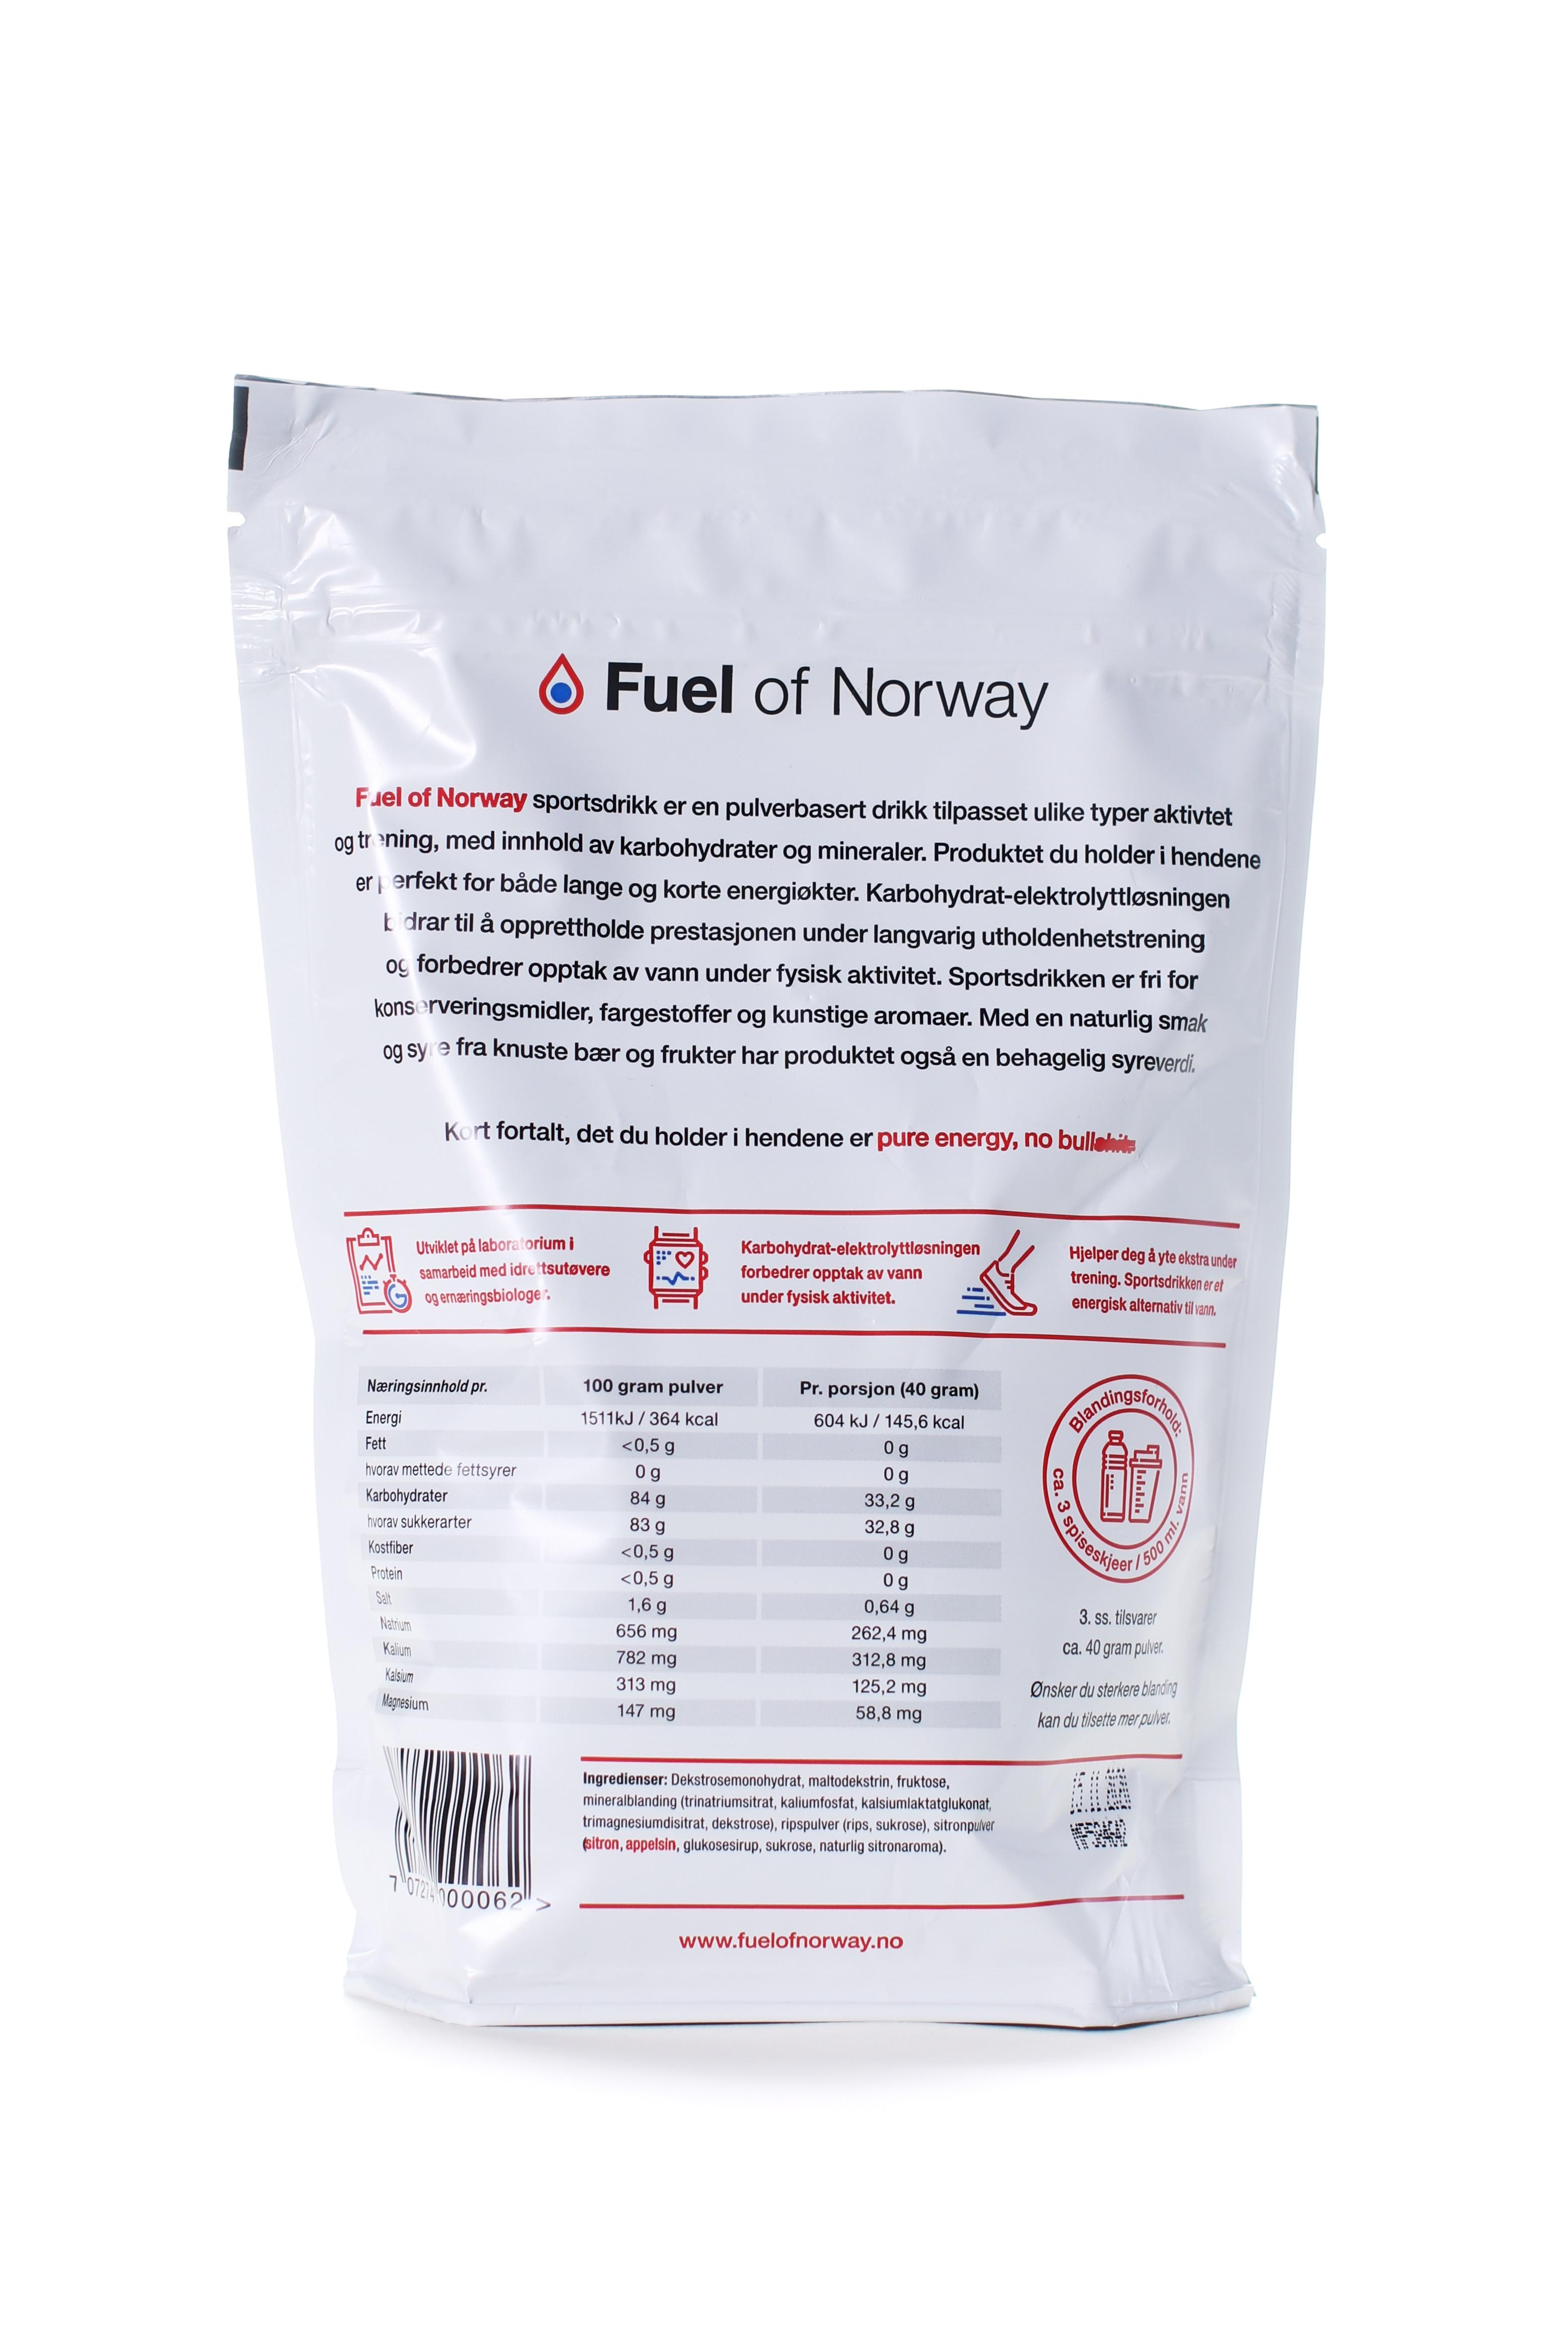 Fuel of Norway Sportsdrikke 0.5kg rips